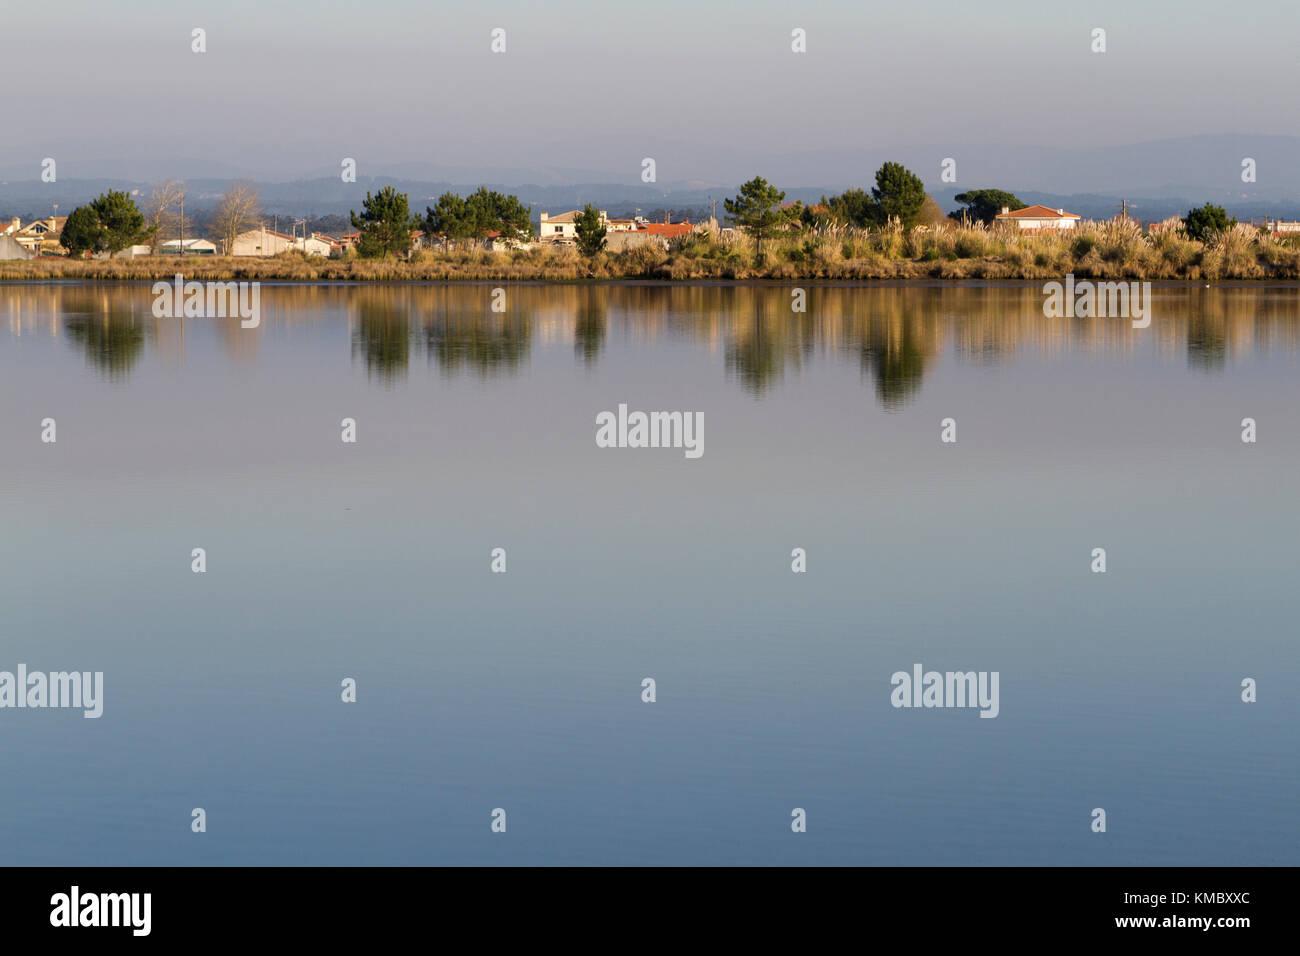 Riverside view of Aveiro's lagoon, an estuarine ecosystem in Portugal. - Stock Image